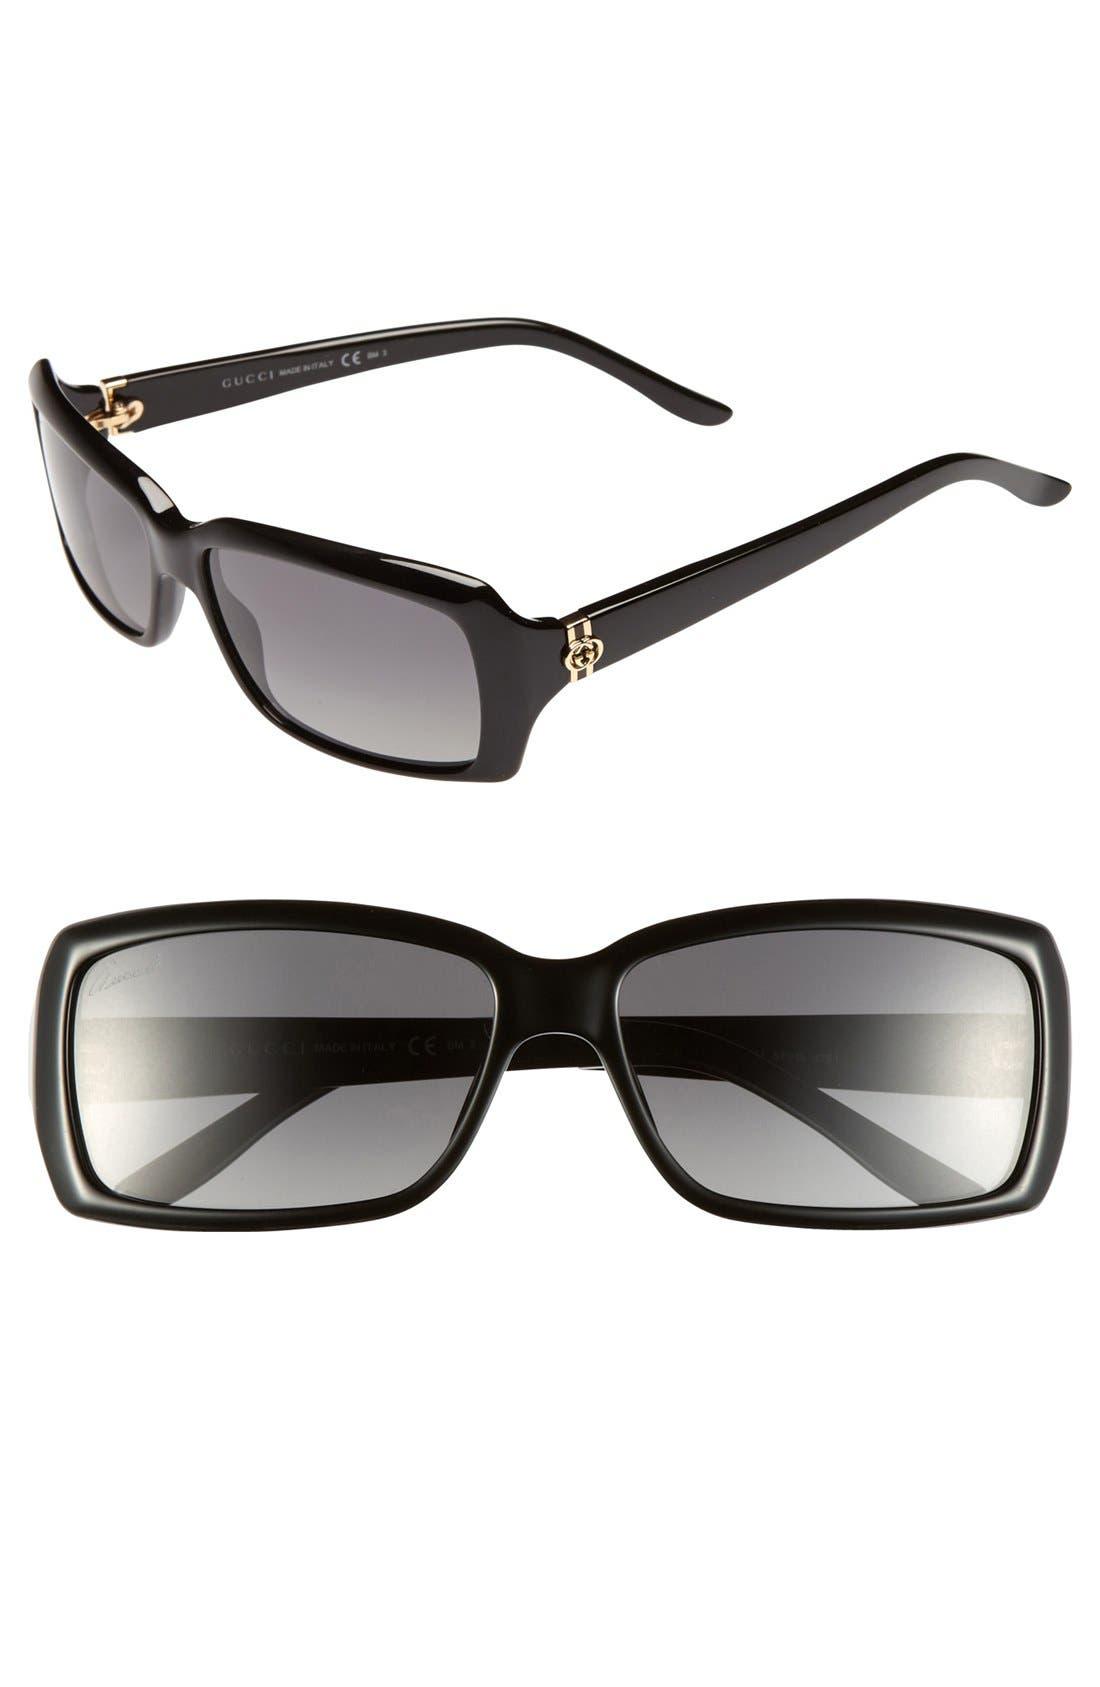 Alternate Image 1 Selected - Gucci 57mm Polarized Sunglasses